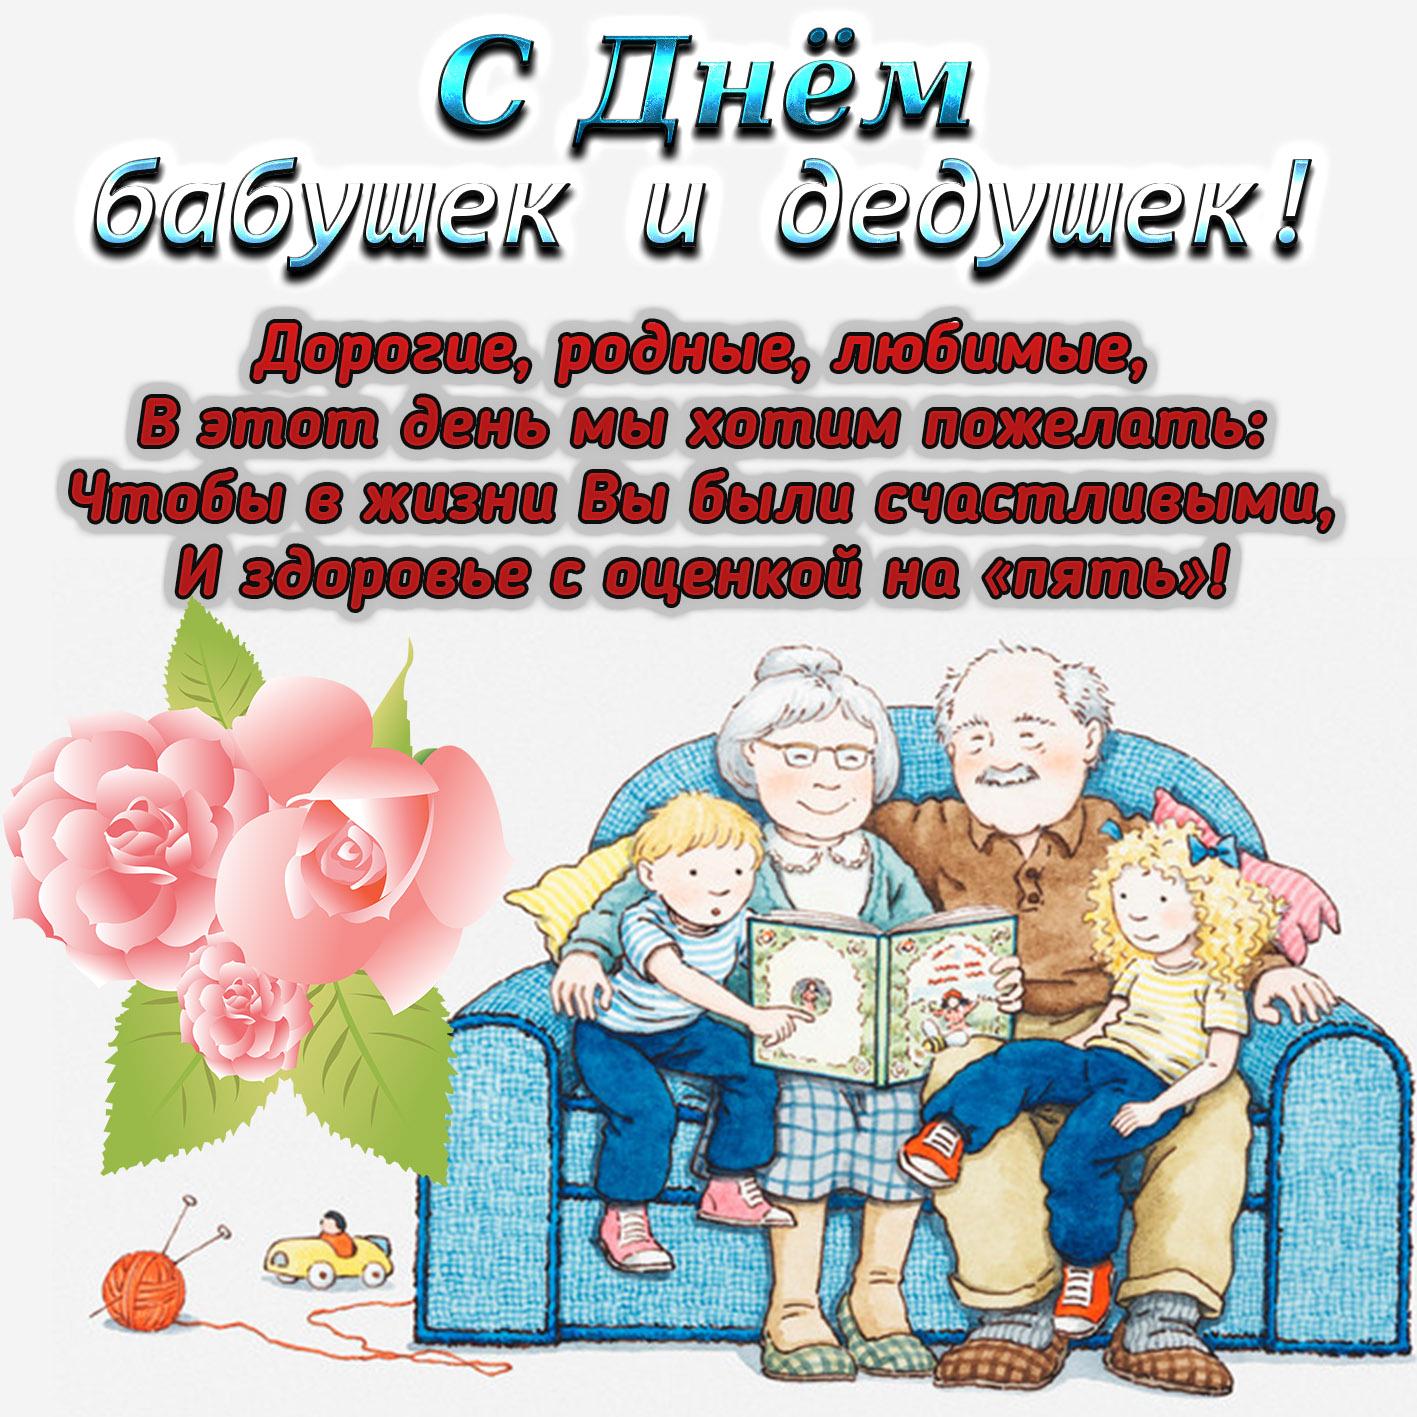 Открытка дедушке или бабушке